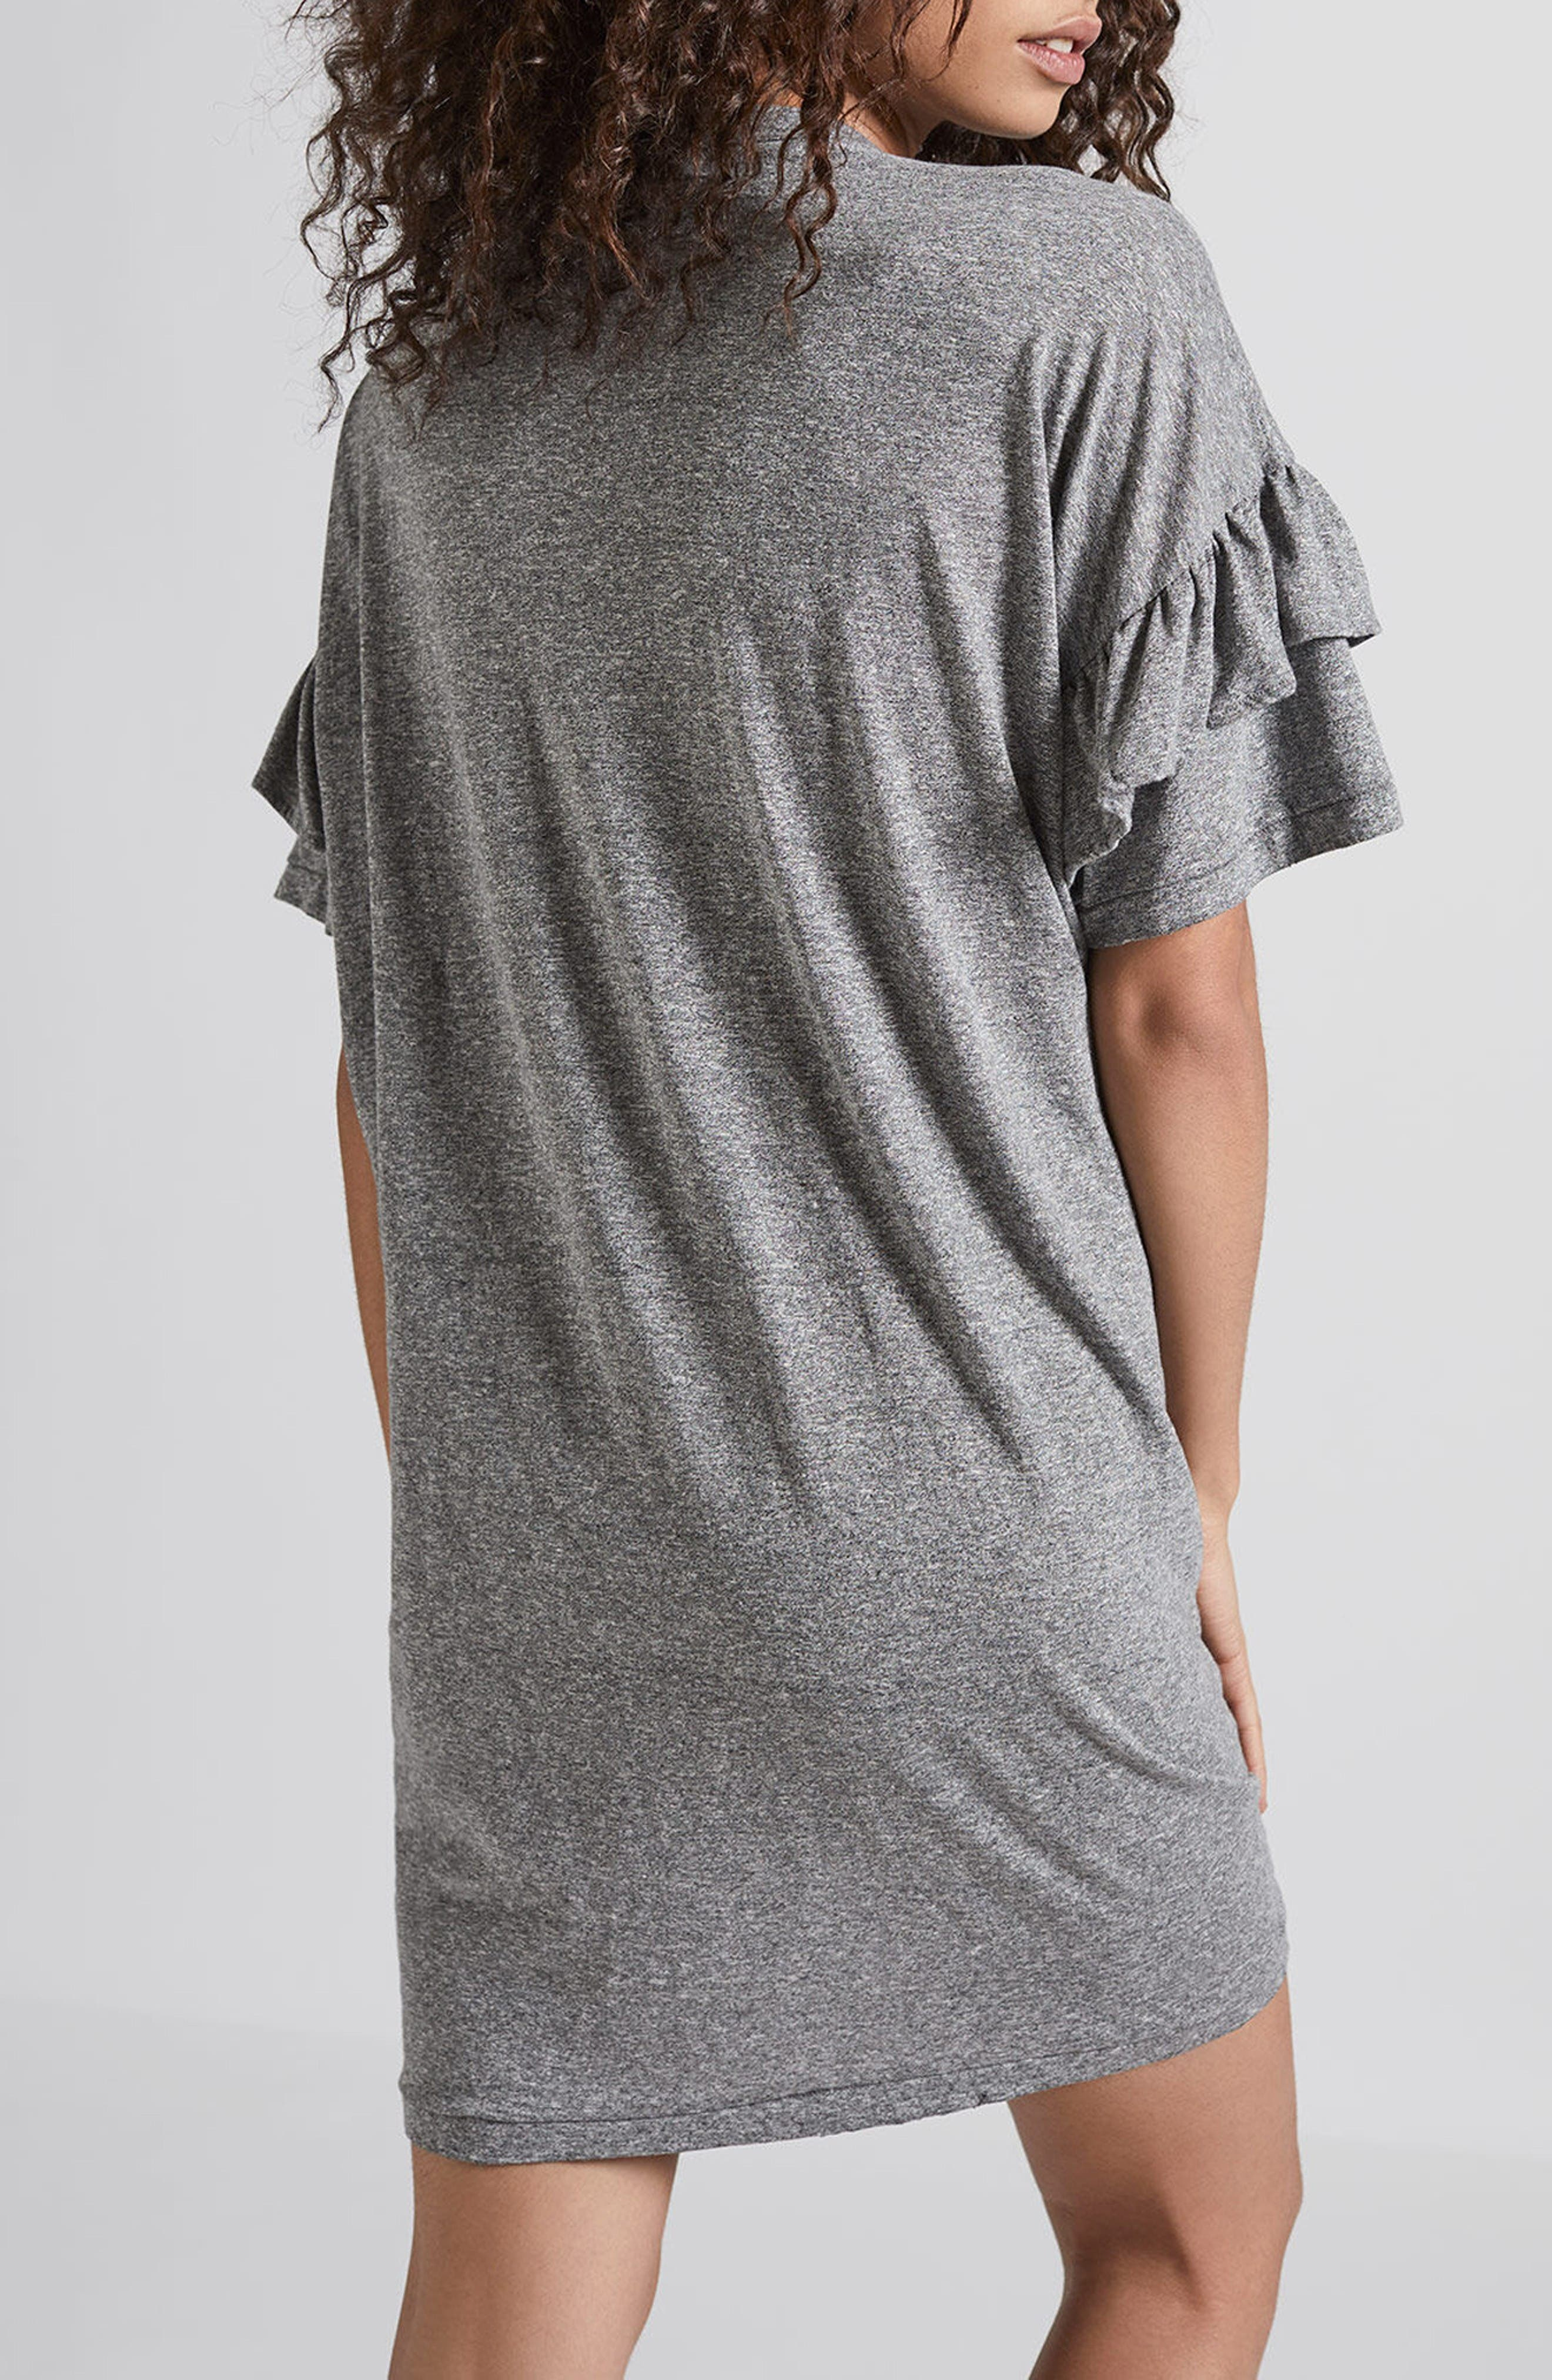 Ruffle Roadie T-Shirt Dress,                             Alternate thumbnail 2, color,                             Heather Grey